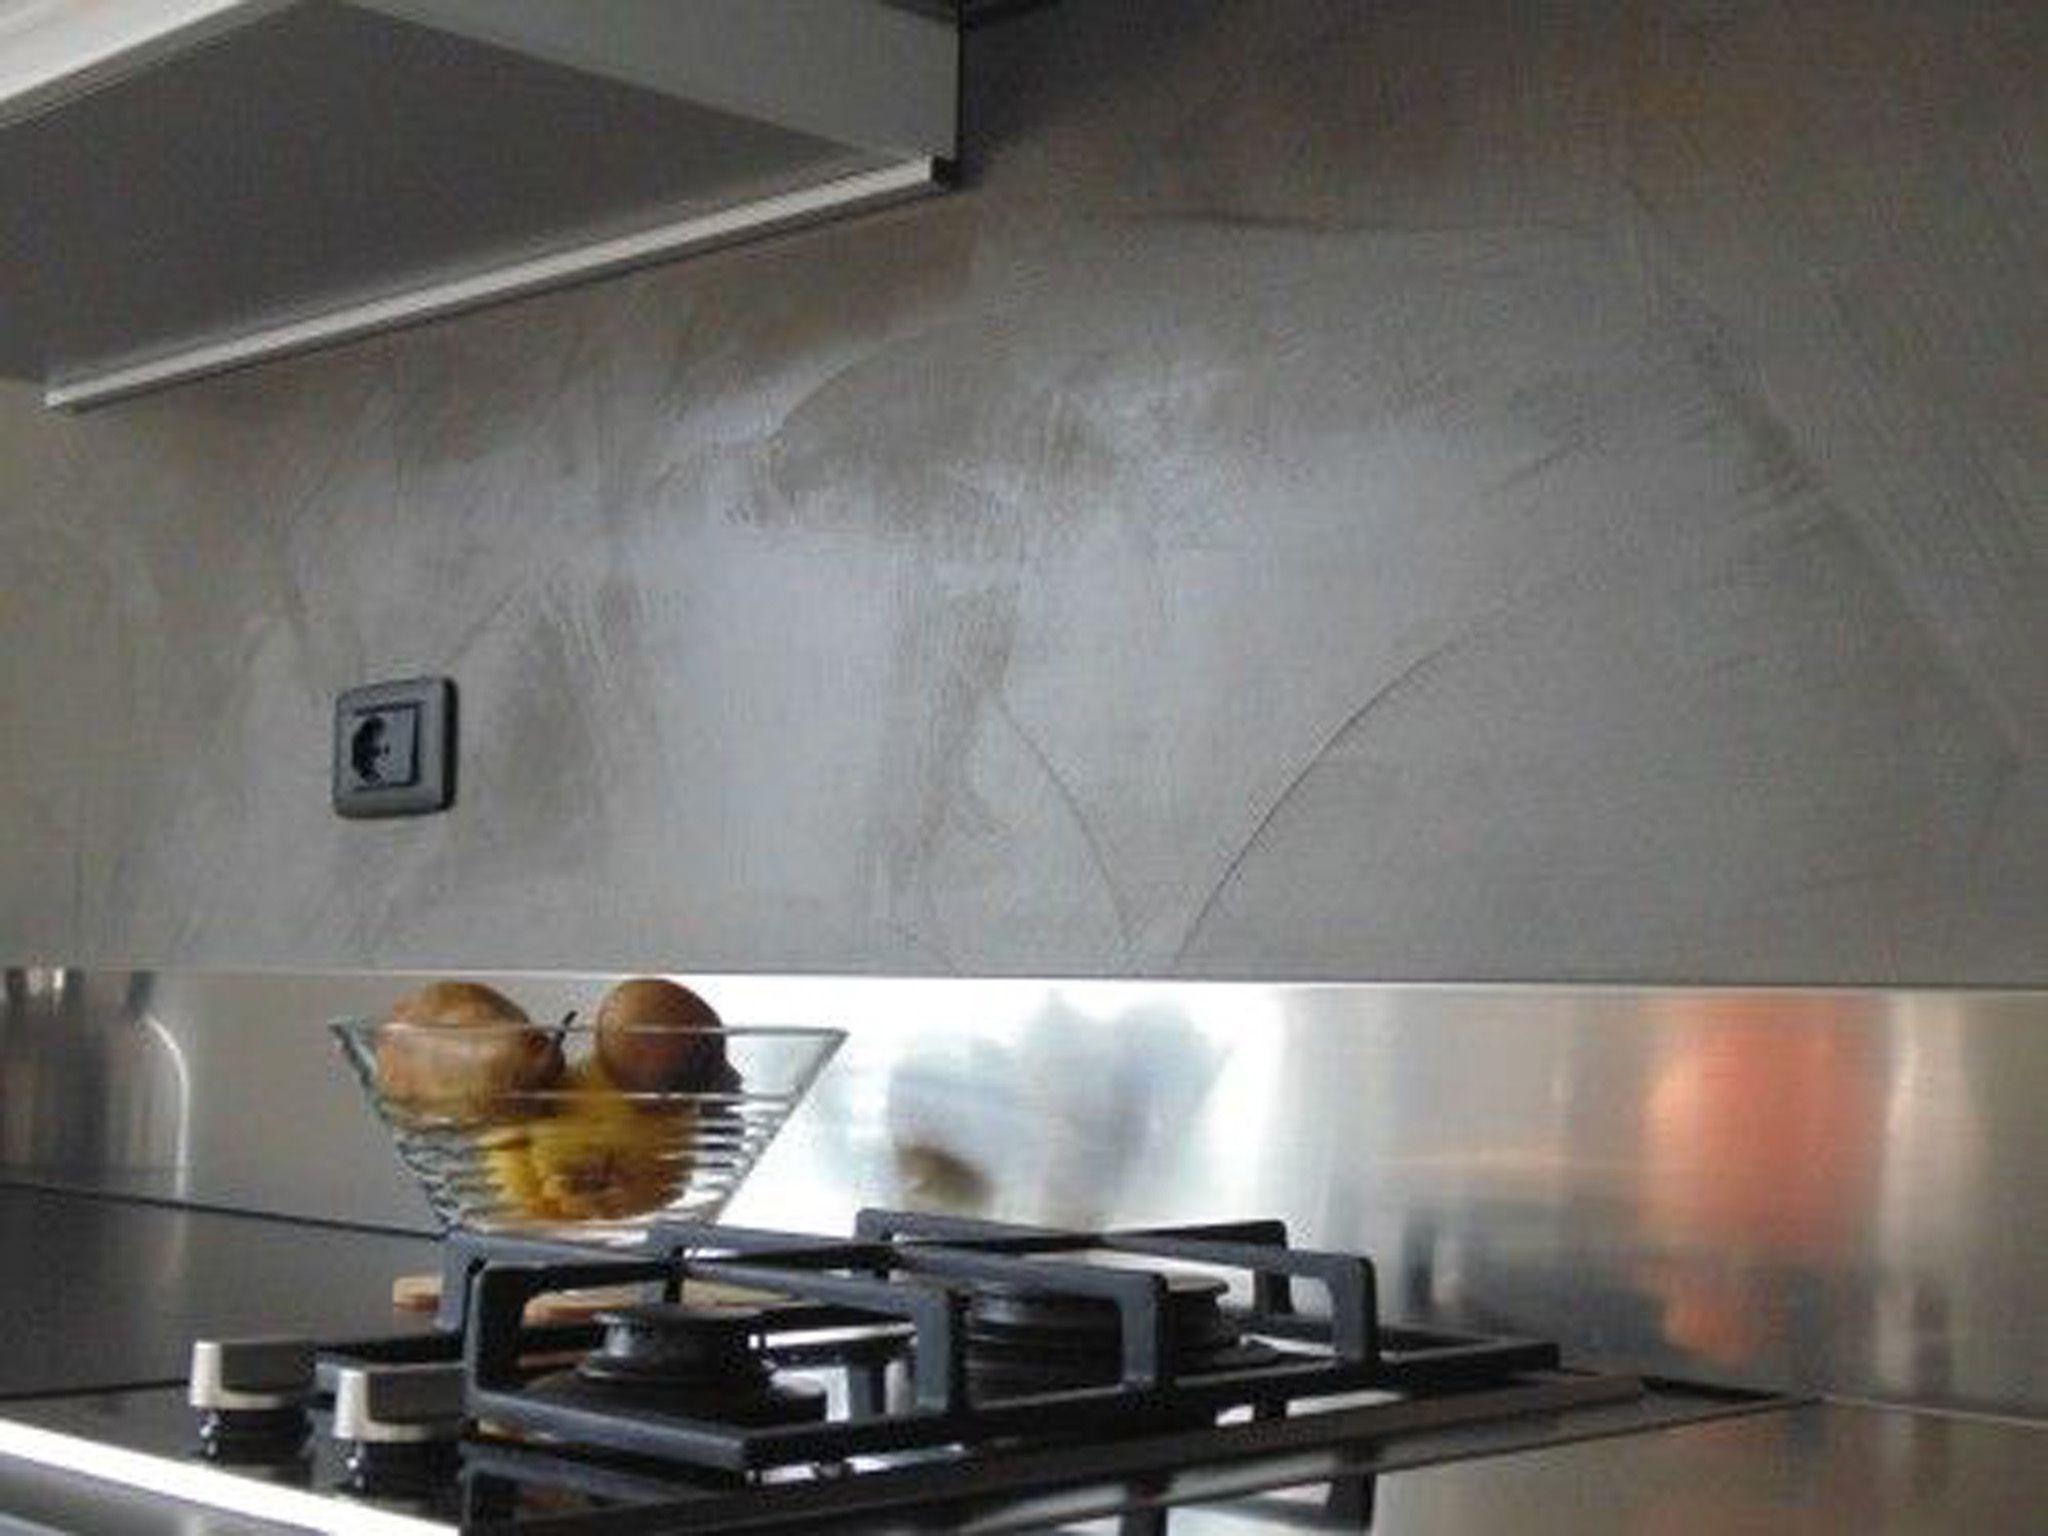 resine parete cucina | Cucina nel 2019 | Cucine, Piastrelle cucina e ...